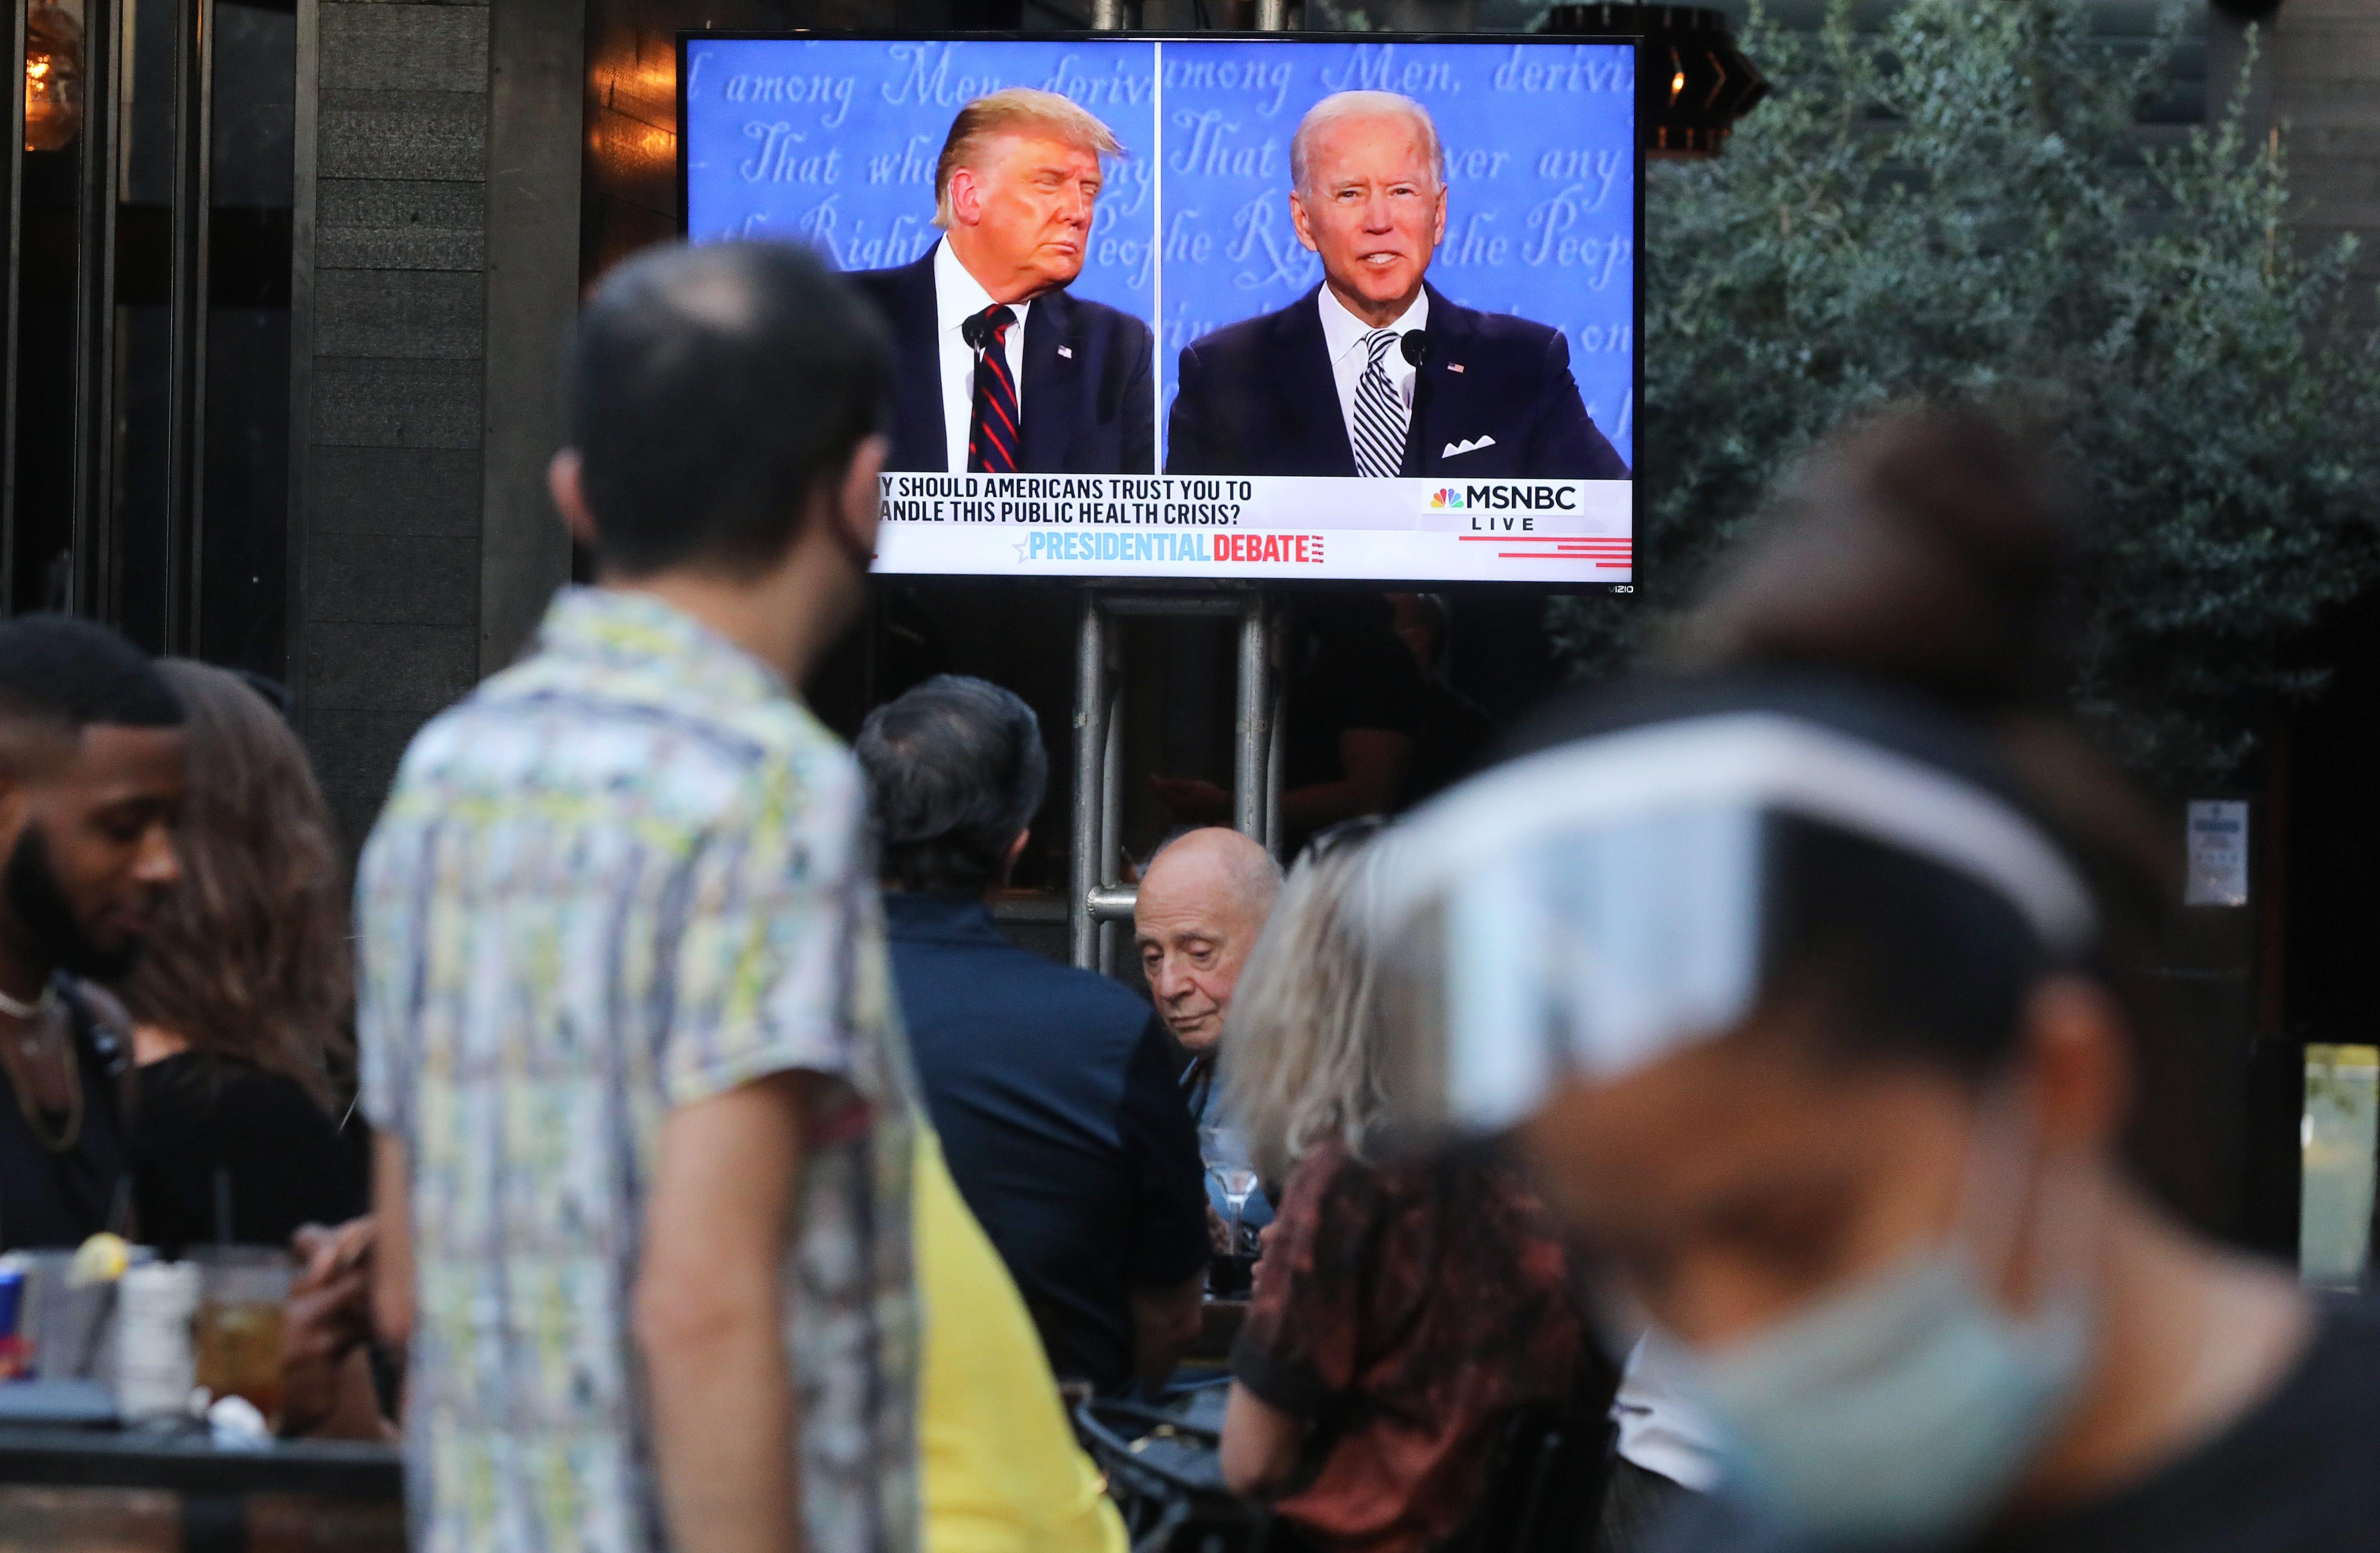 Social media says Trump, Biden debate was less negative and declared Biden the winner